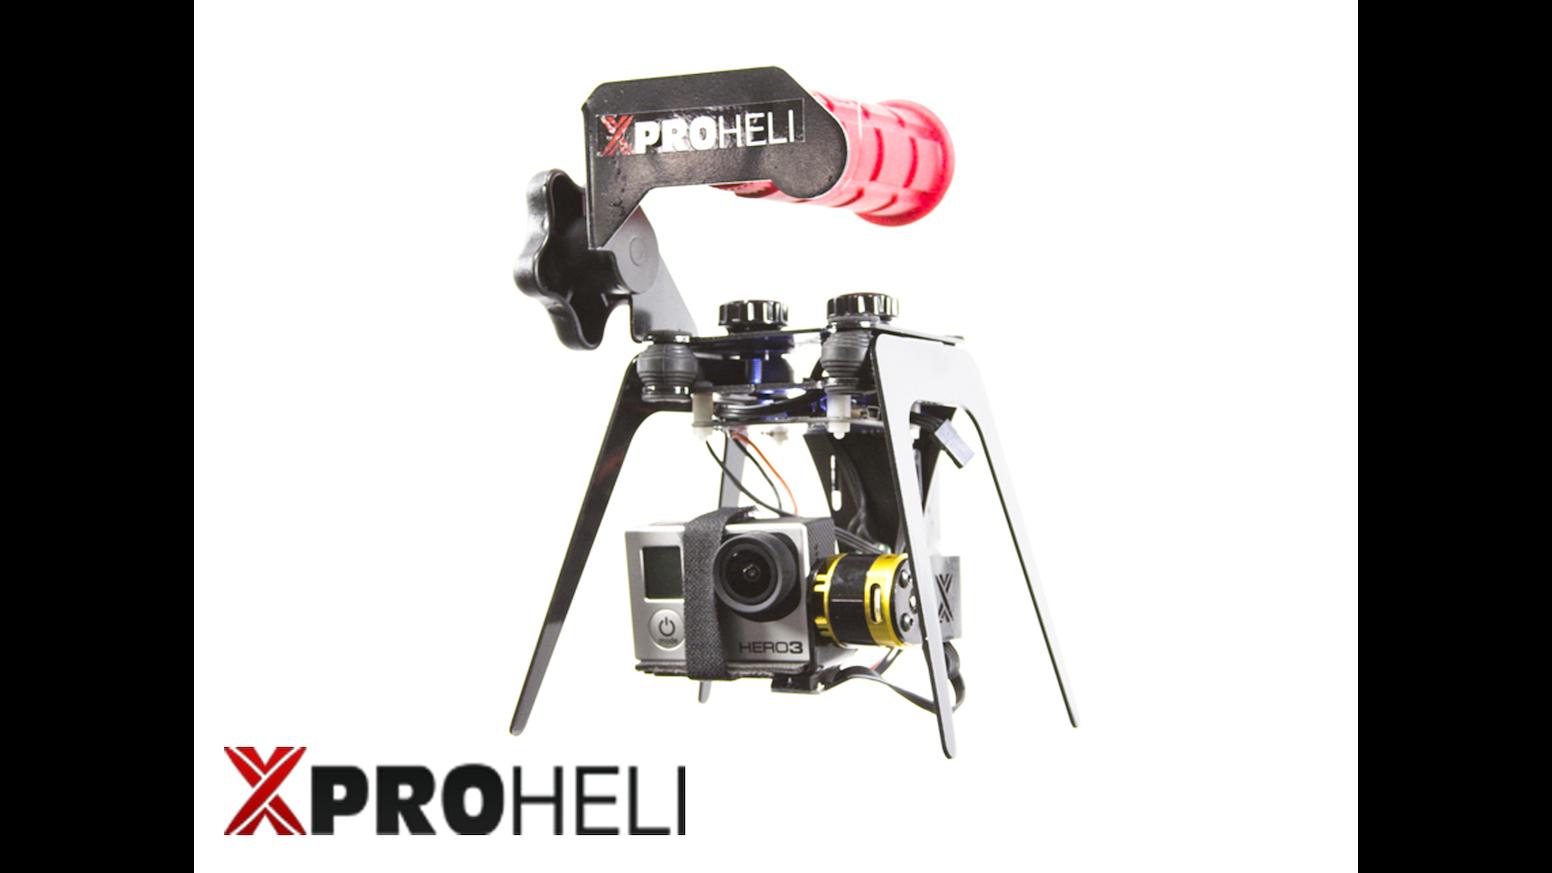 XPG Brushless Gimbal for GoPro Hero 2/3 by XPROHELI by